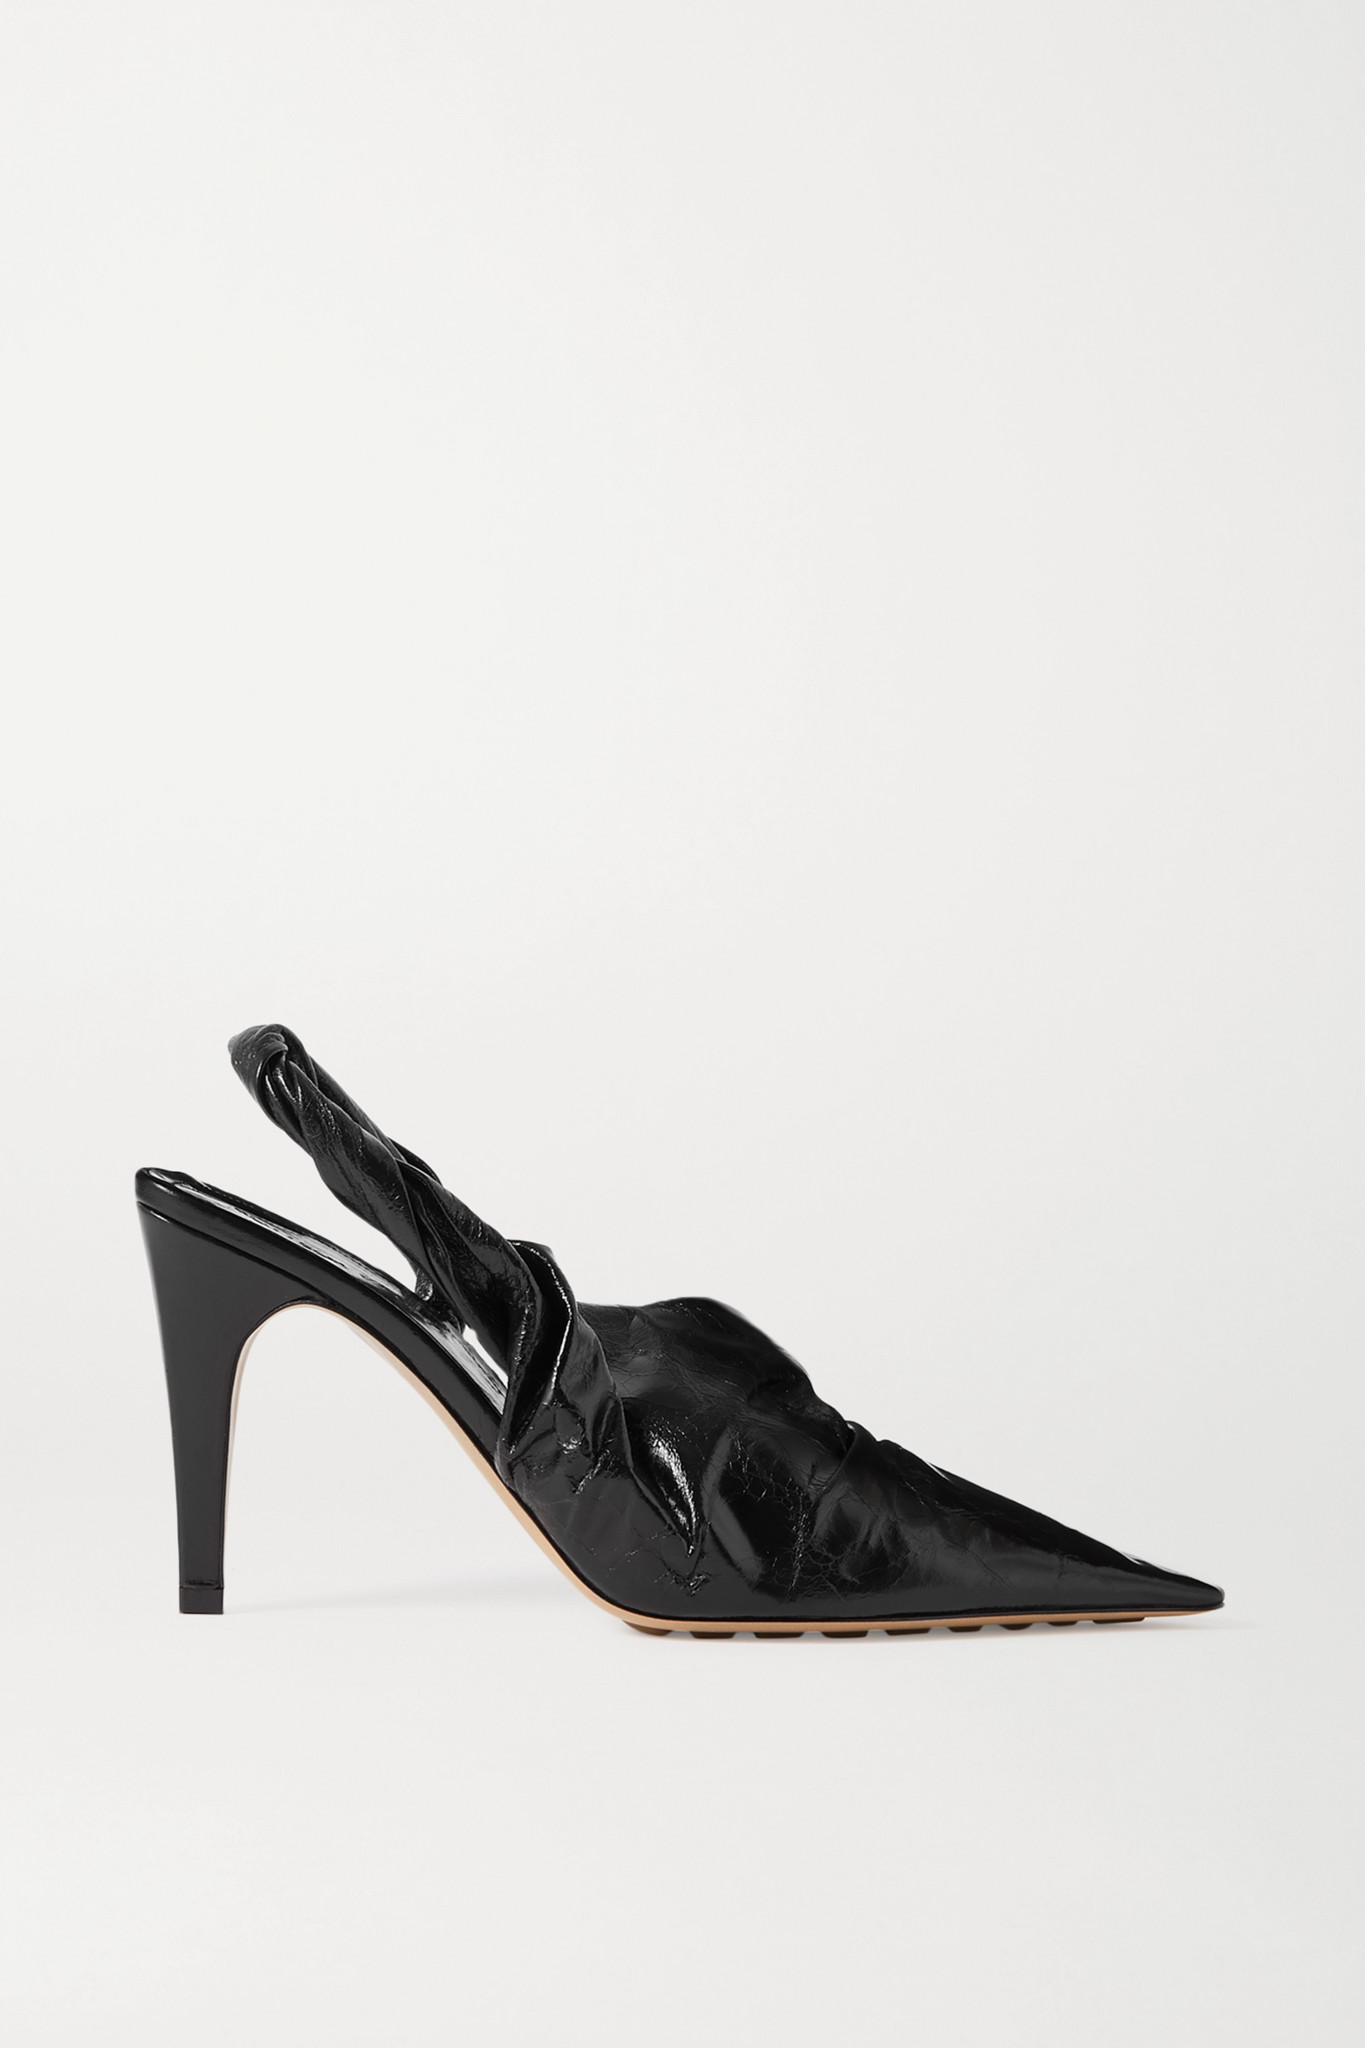 BOTTEGA VENETA - 褶皱亮面皮革露跟高跟鞋 - 黑色 - IT37.5